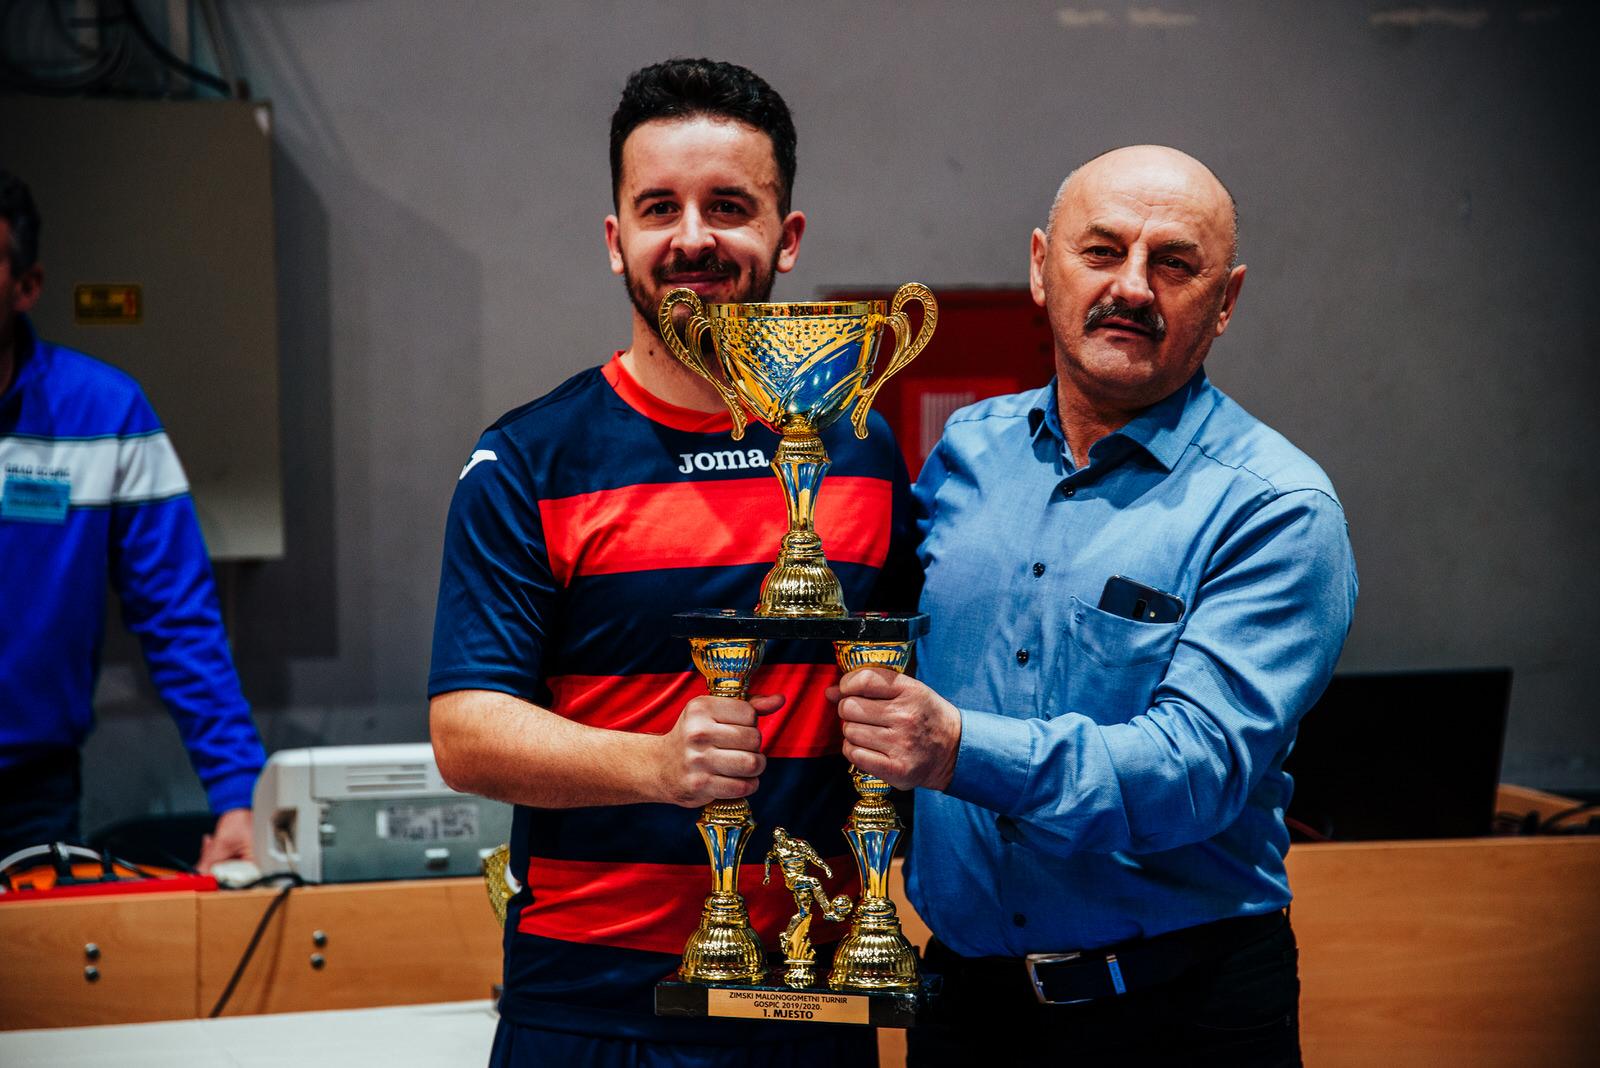 likaclub_zimska-malonogometna-liga-gospić_2019-20-137